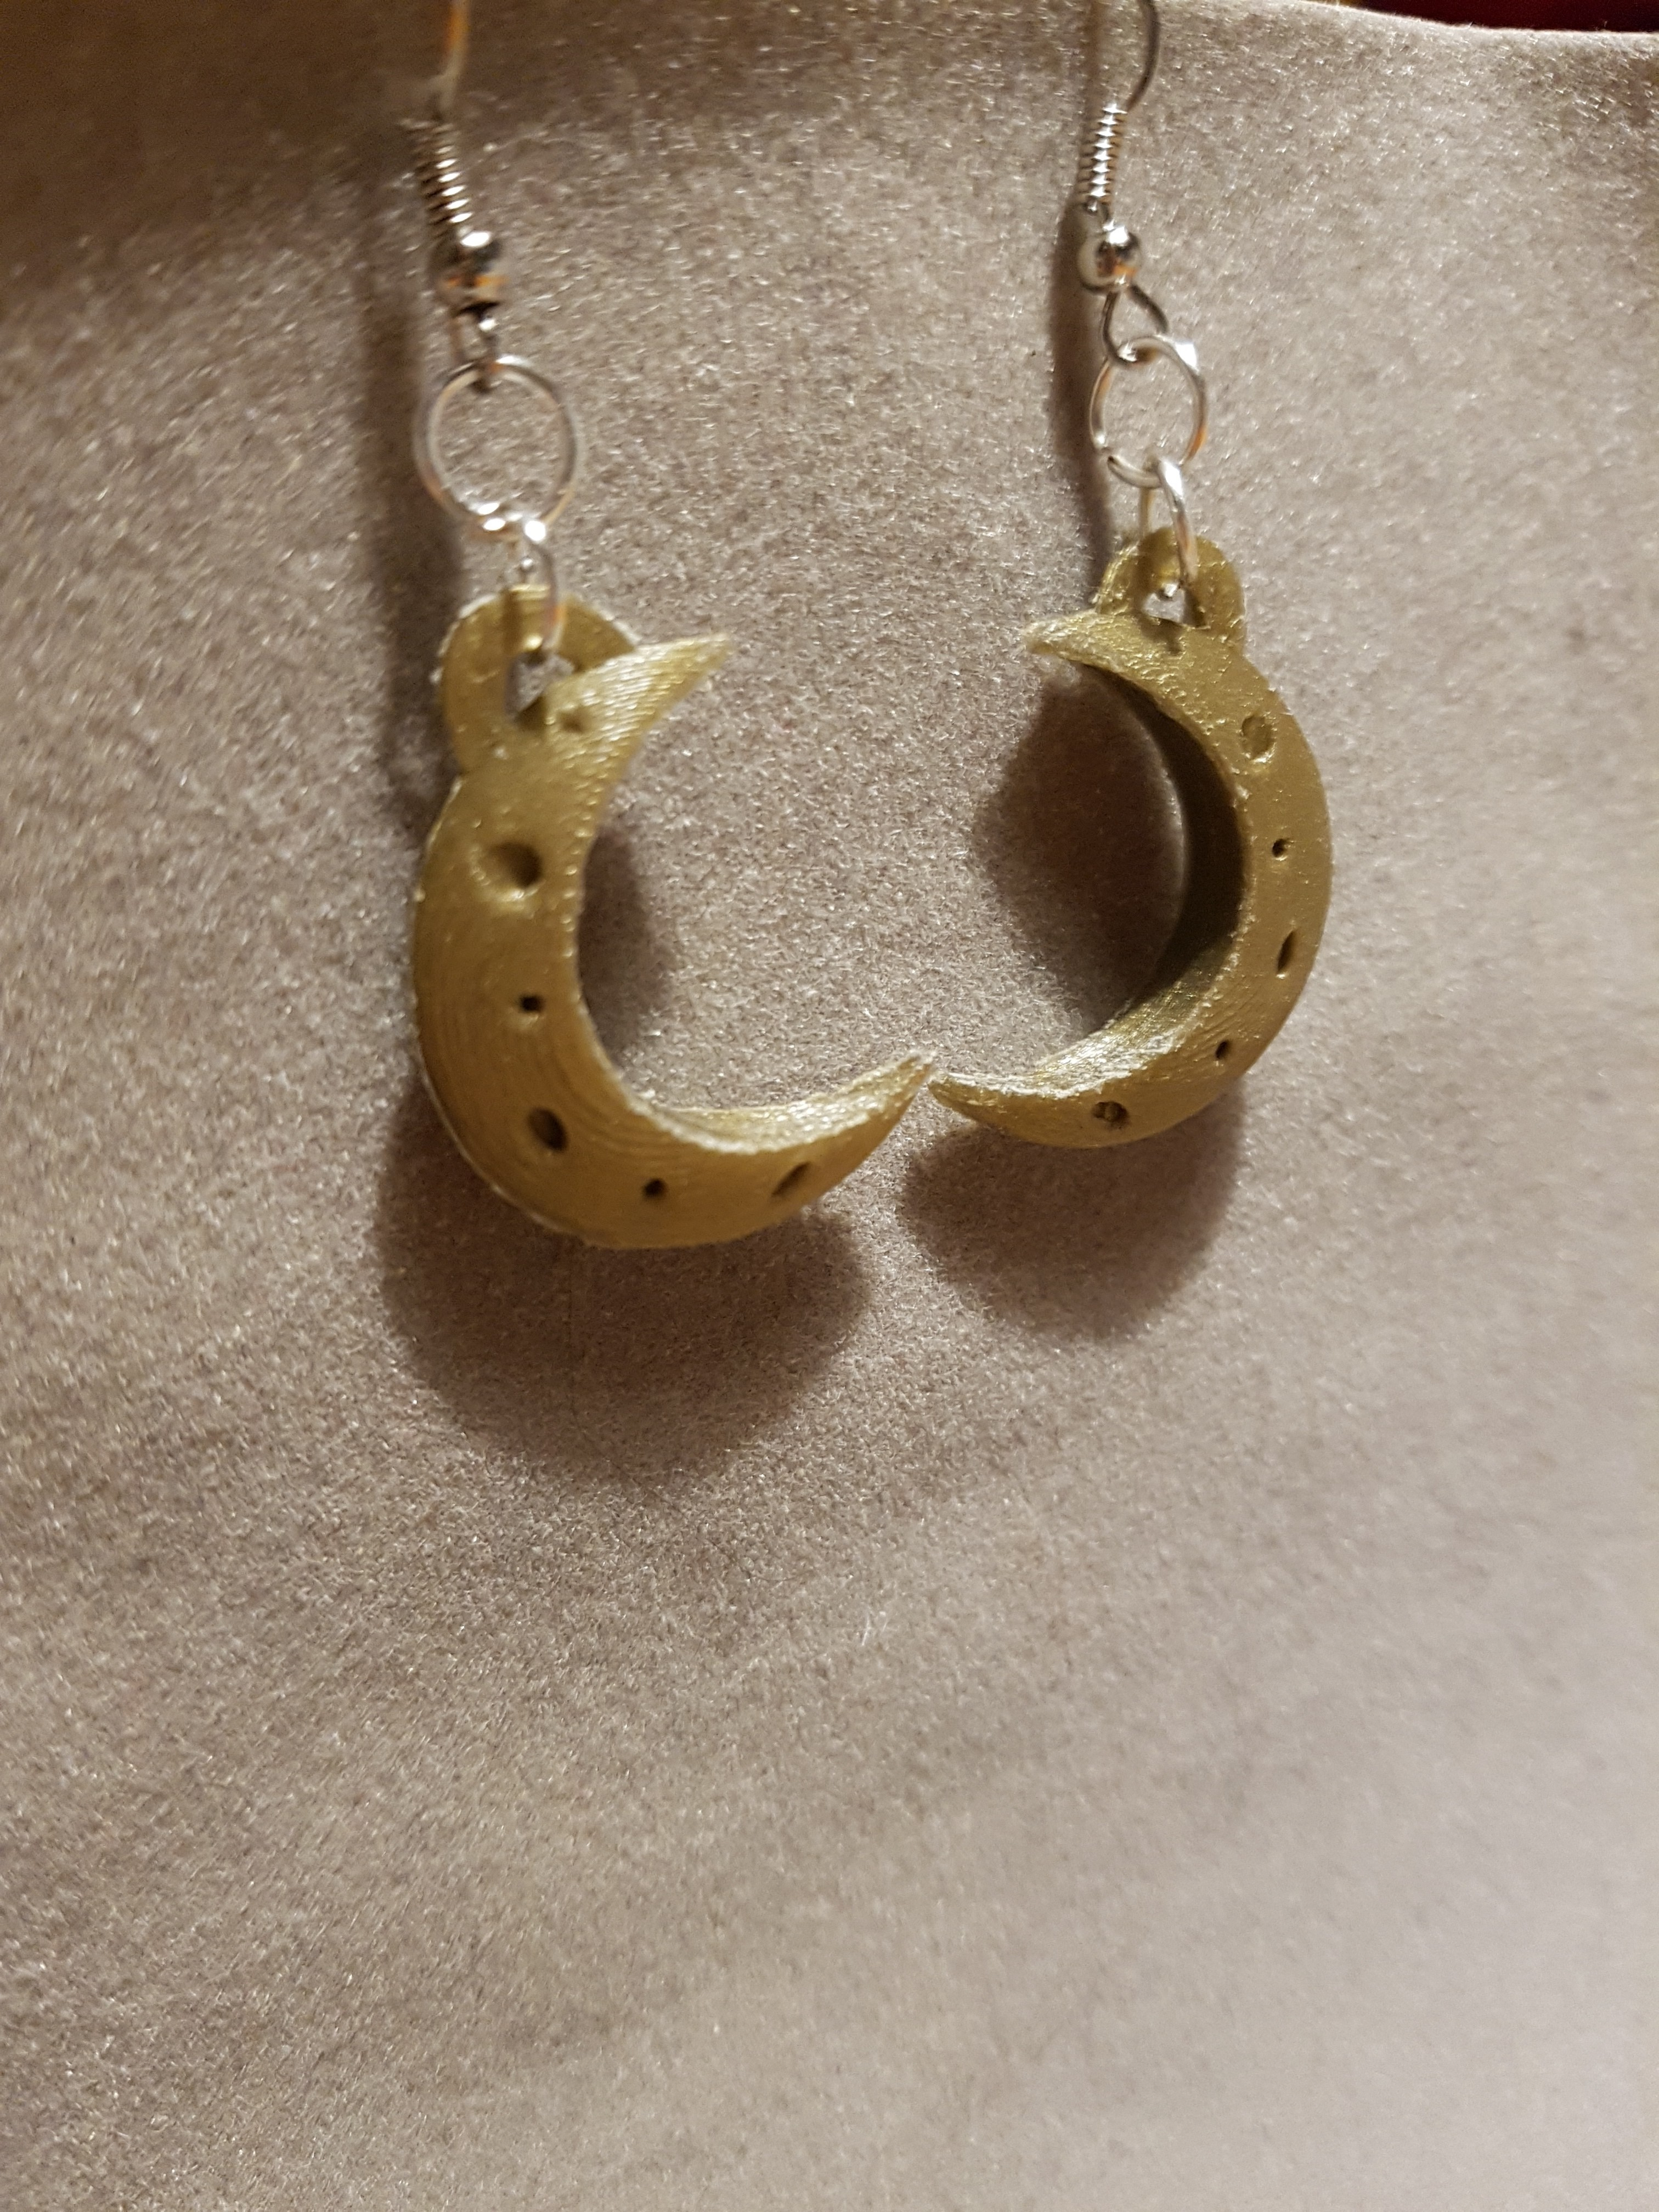 20180204_193009.jpg Download STL file 2 moon earrings • Template to 3D print, catf3d